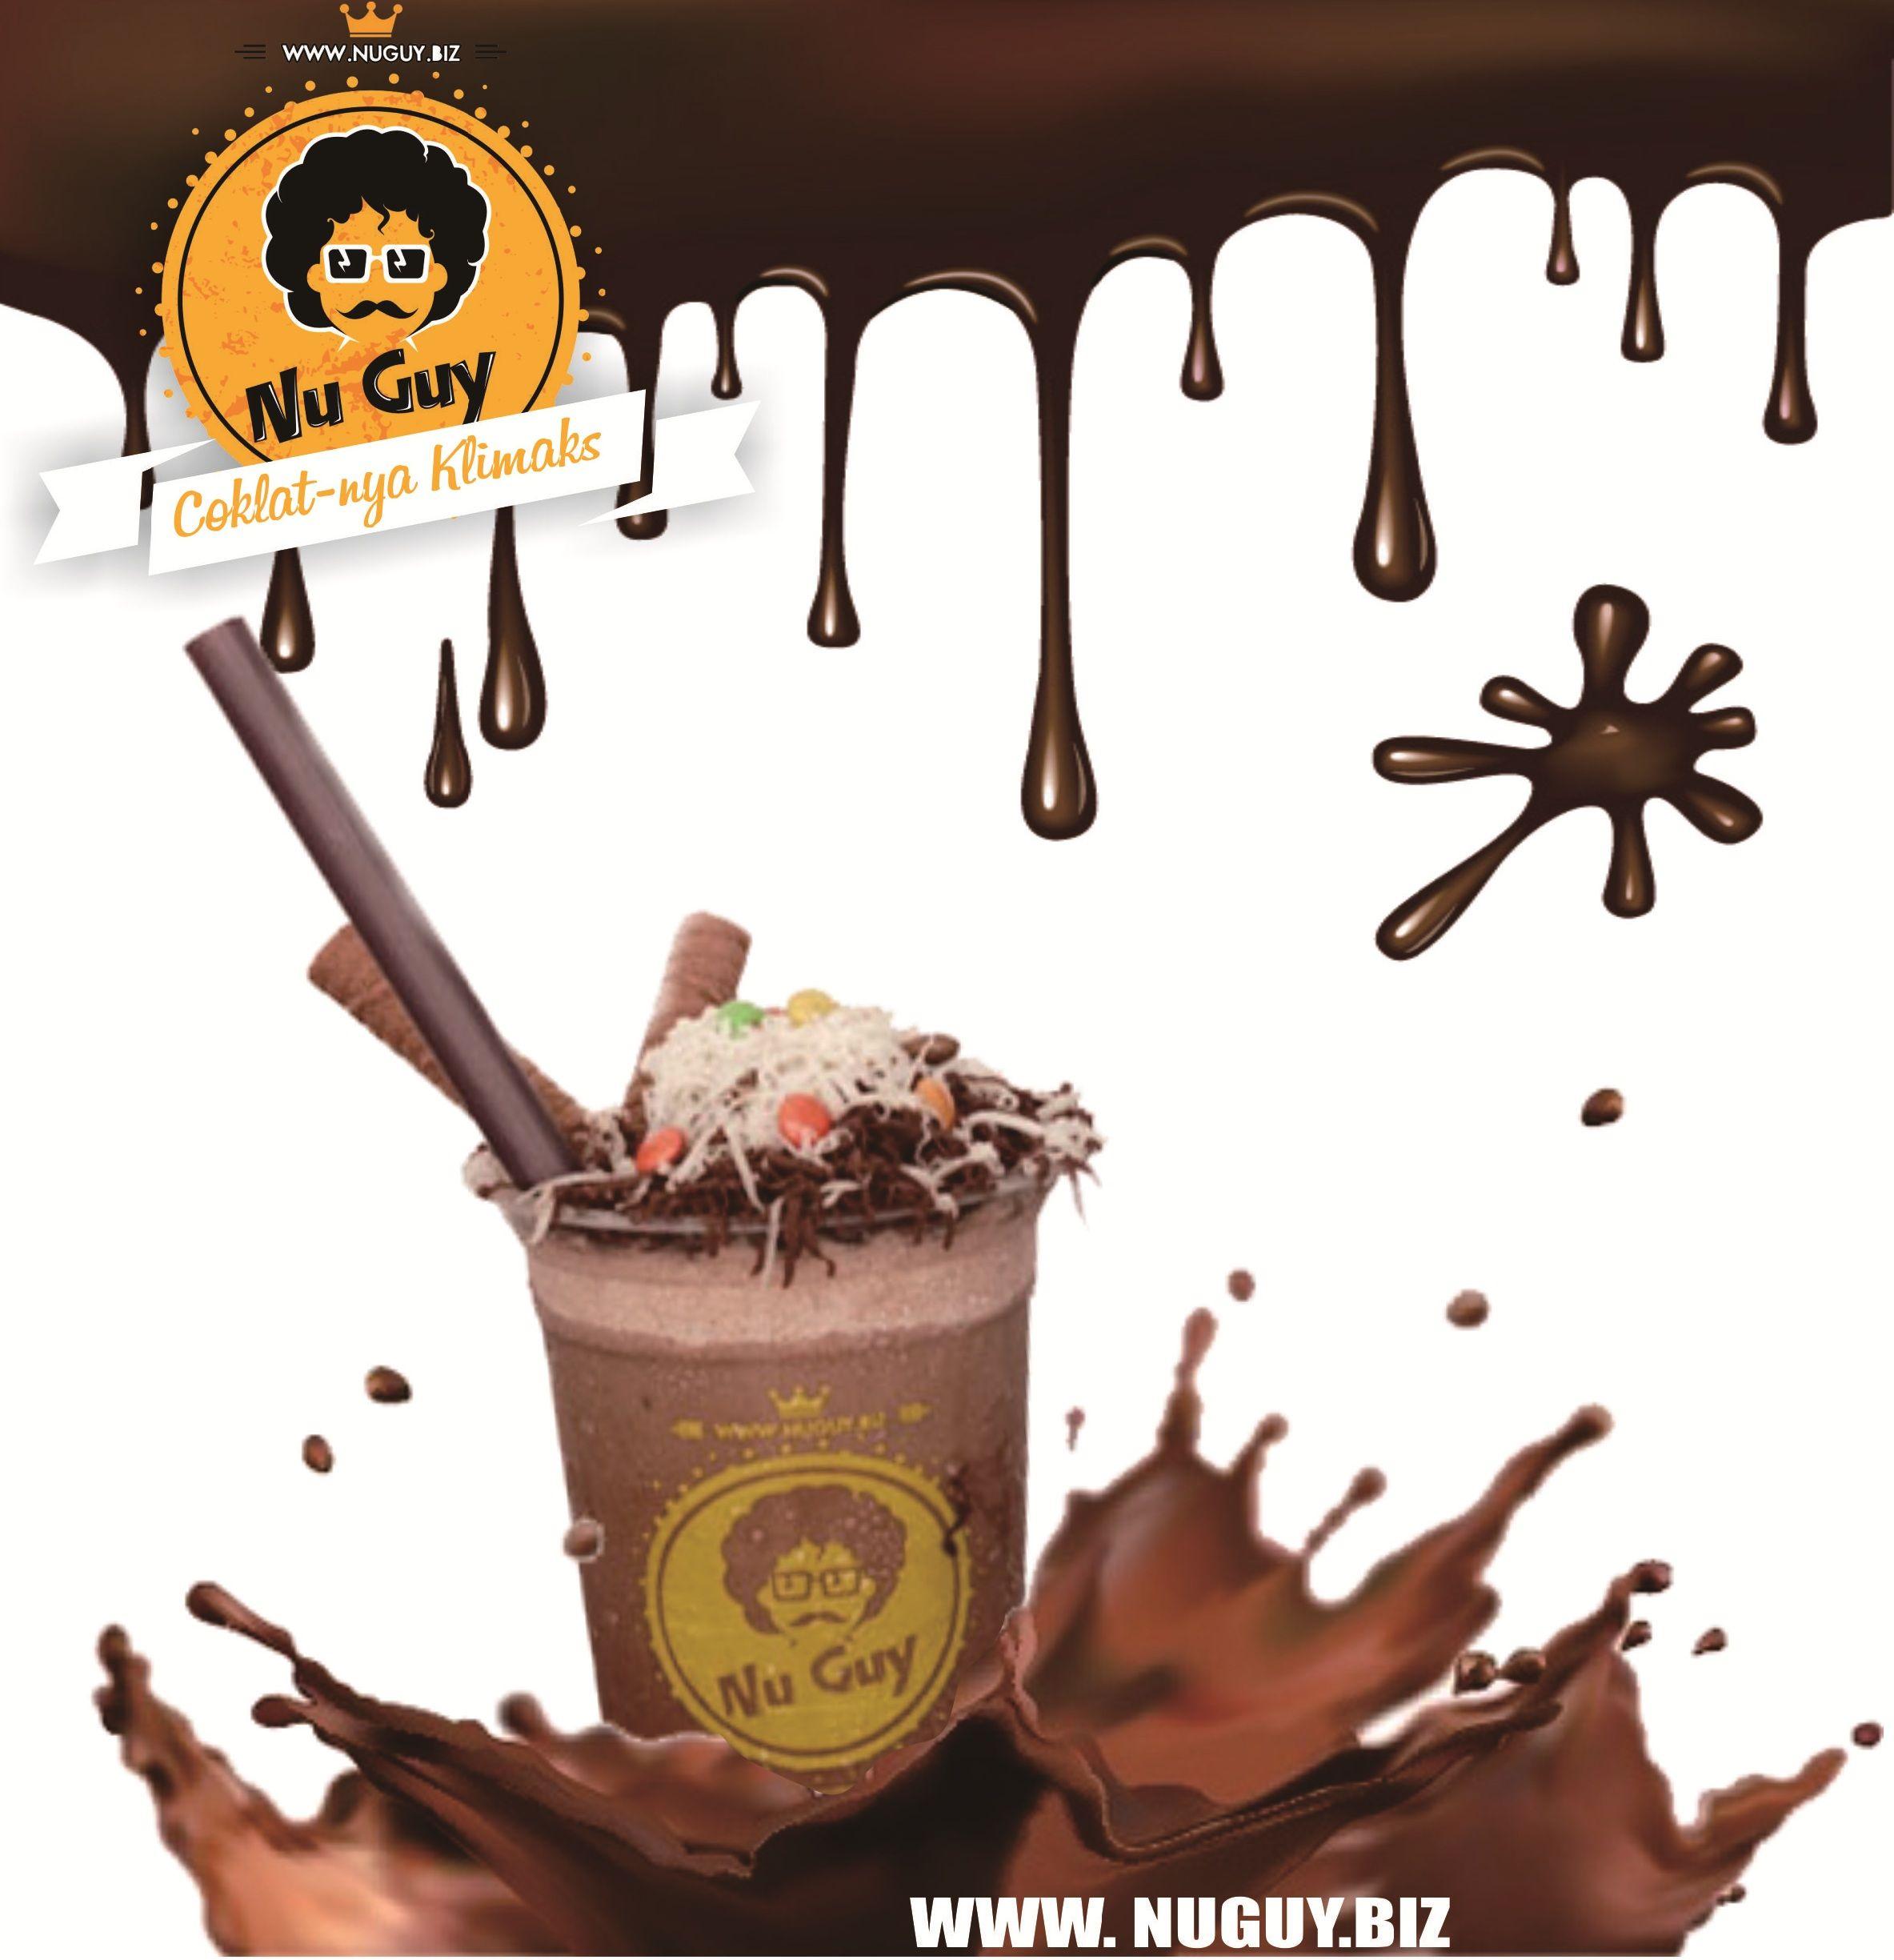 Peluang Usaha Bisnis Waralaba 3 Jutaan Cepat Balik Modal Minuman Coklat Nuguy Harga Paket Super Hemat Coklat Minuman